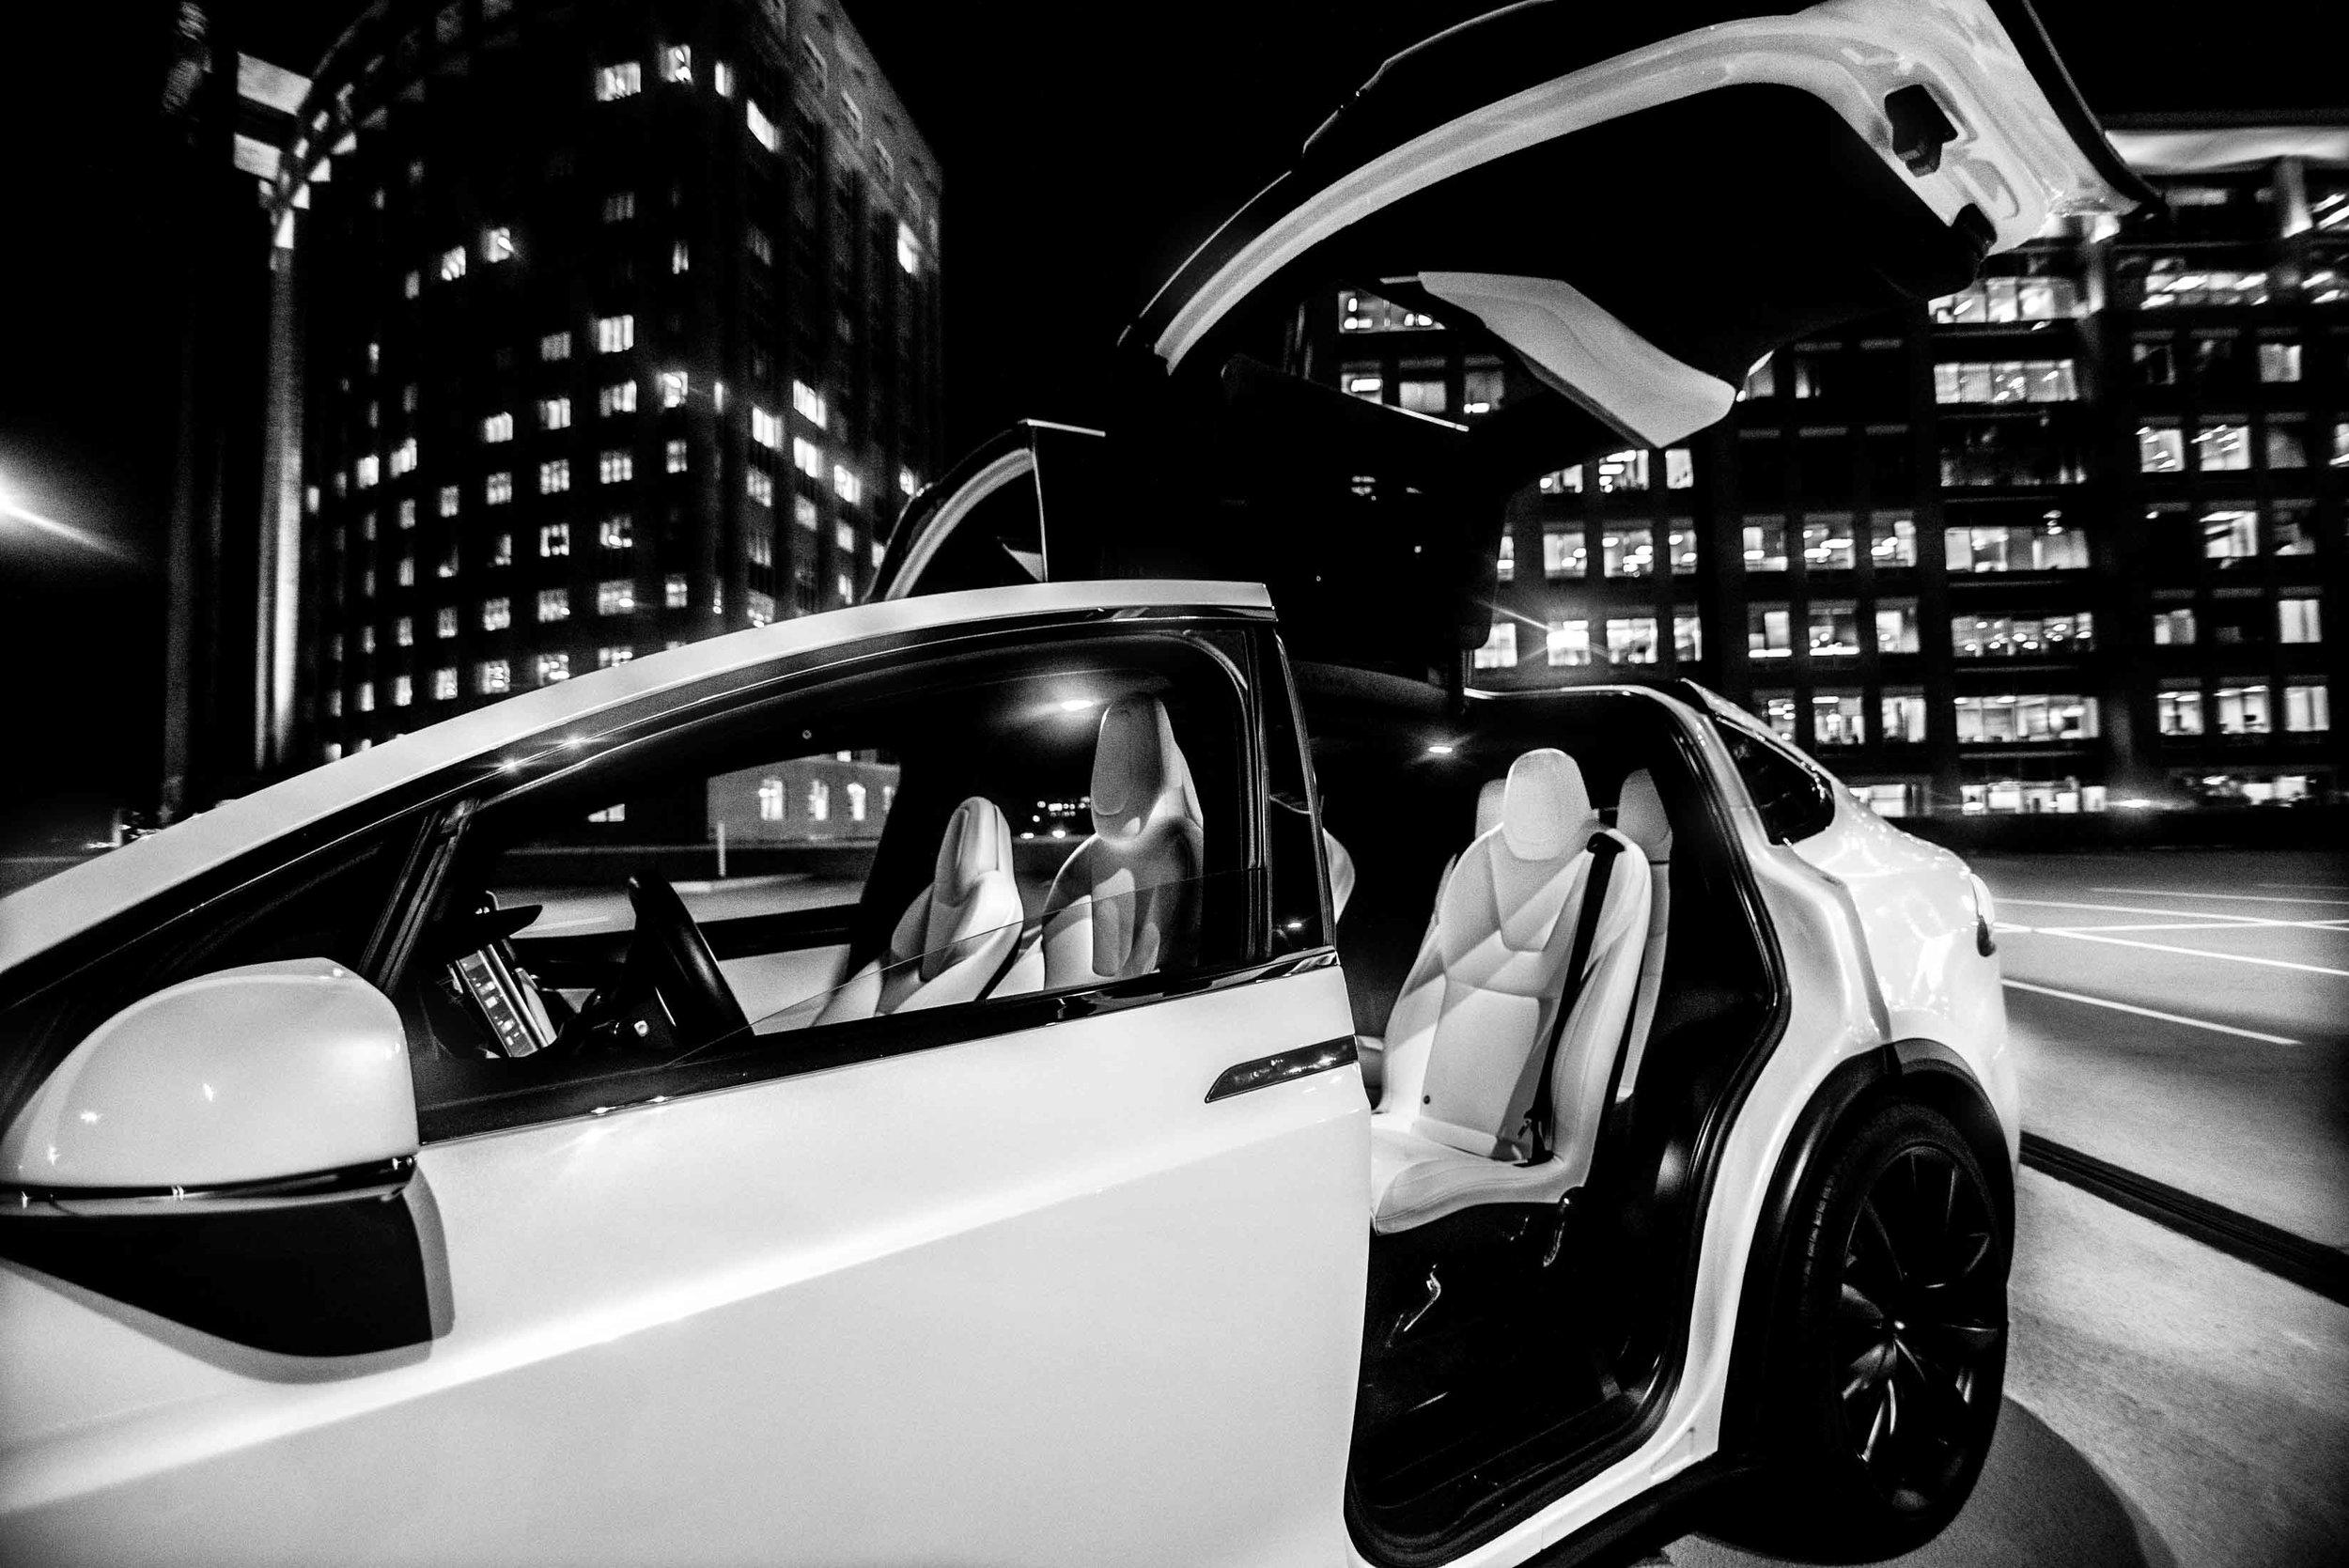 fleet+vehicle+sexy+car+photo+video+speed+tesla+p100d+vadym+guliuk+photography-18.jpg